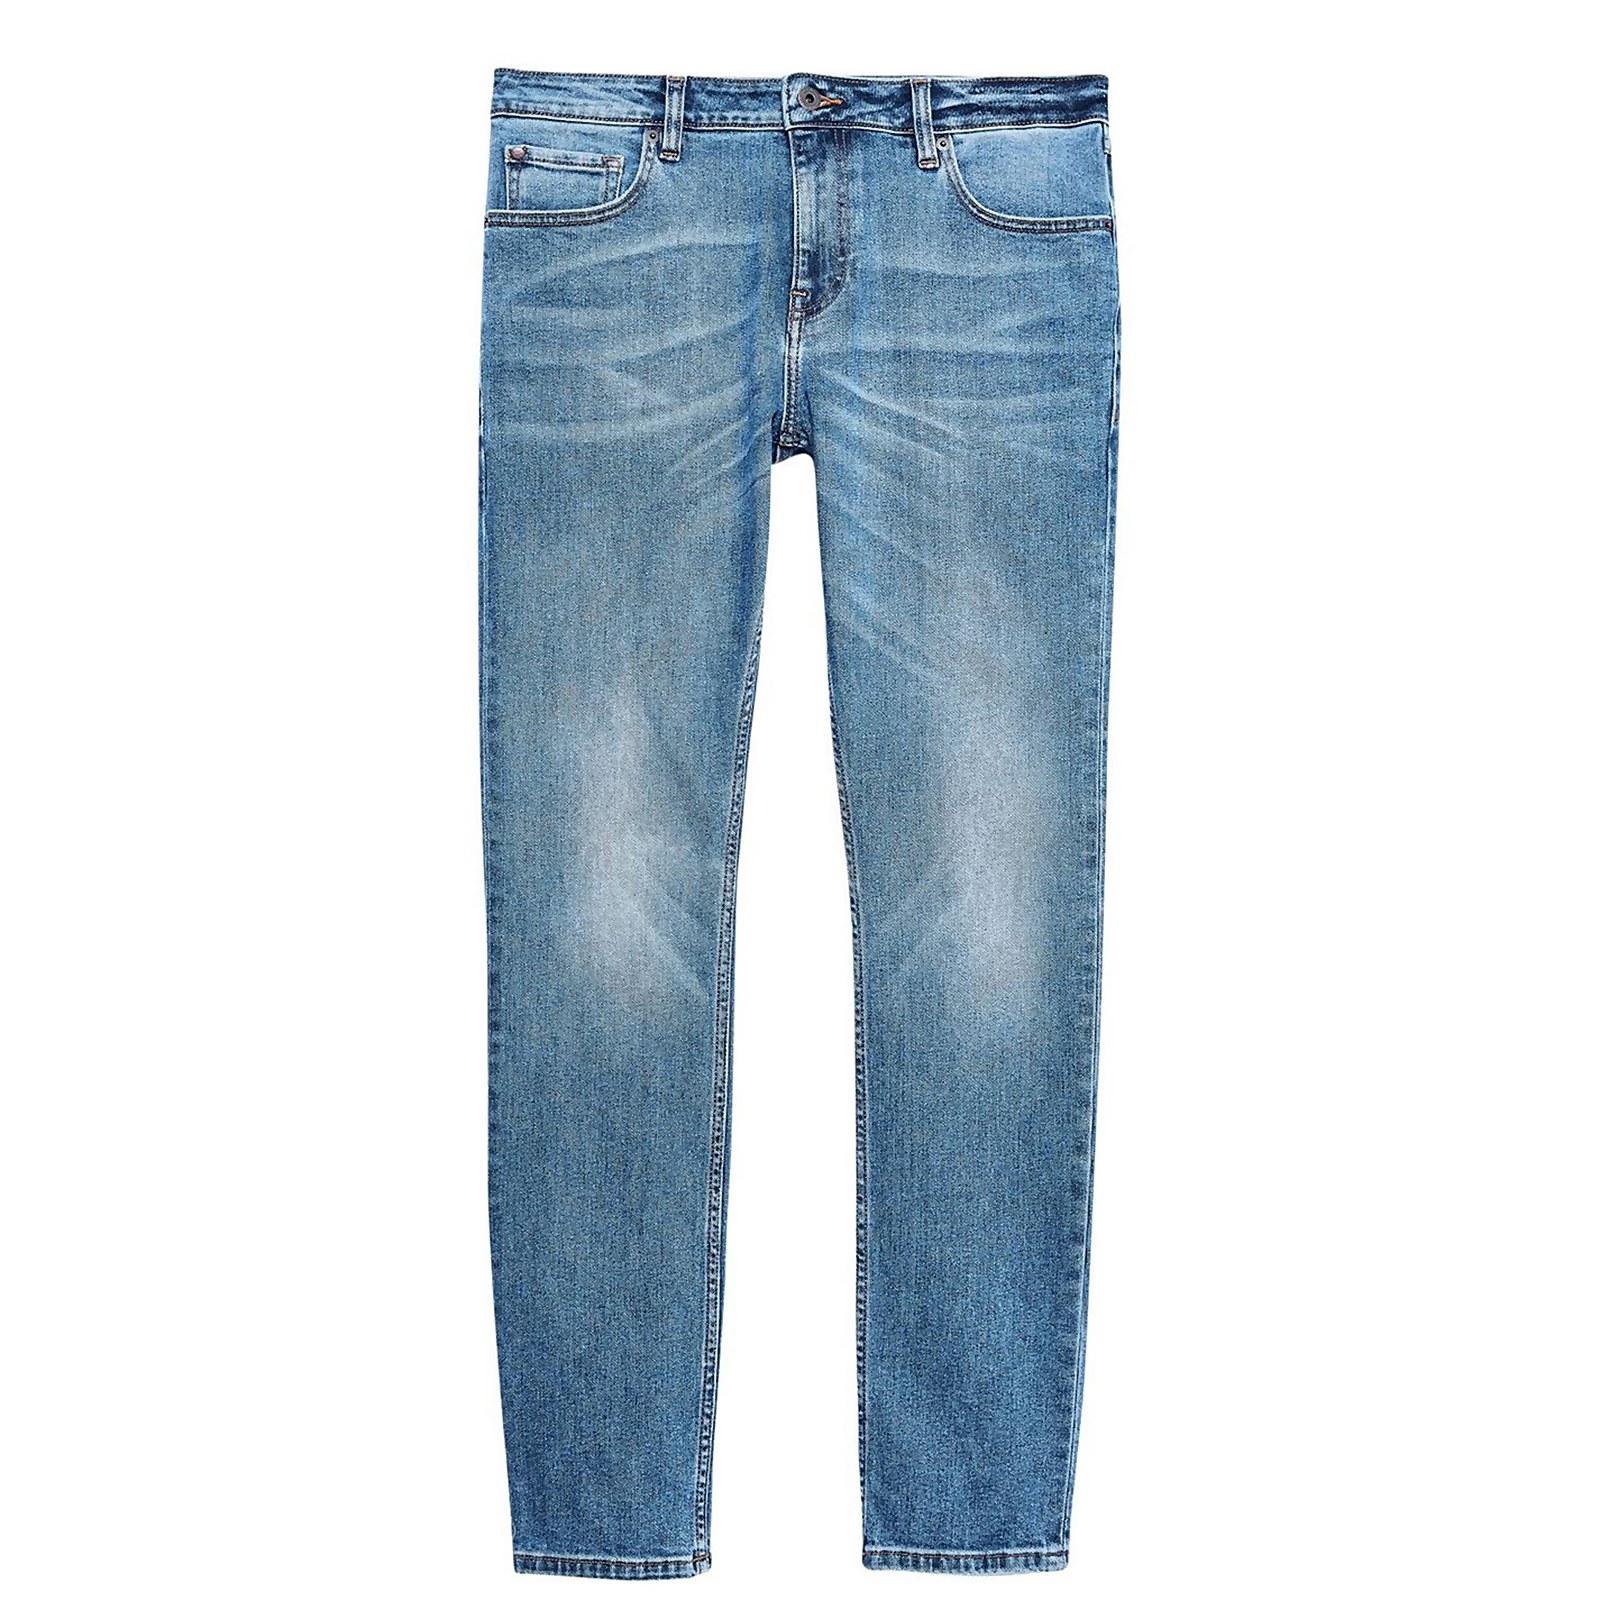 Skinny Jeans - Mid Indigo - 30R